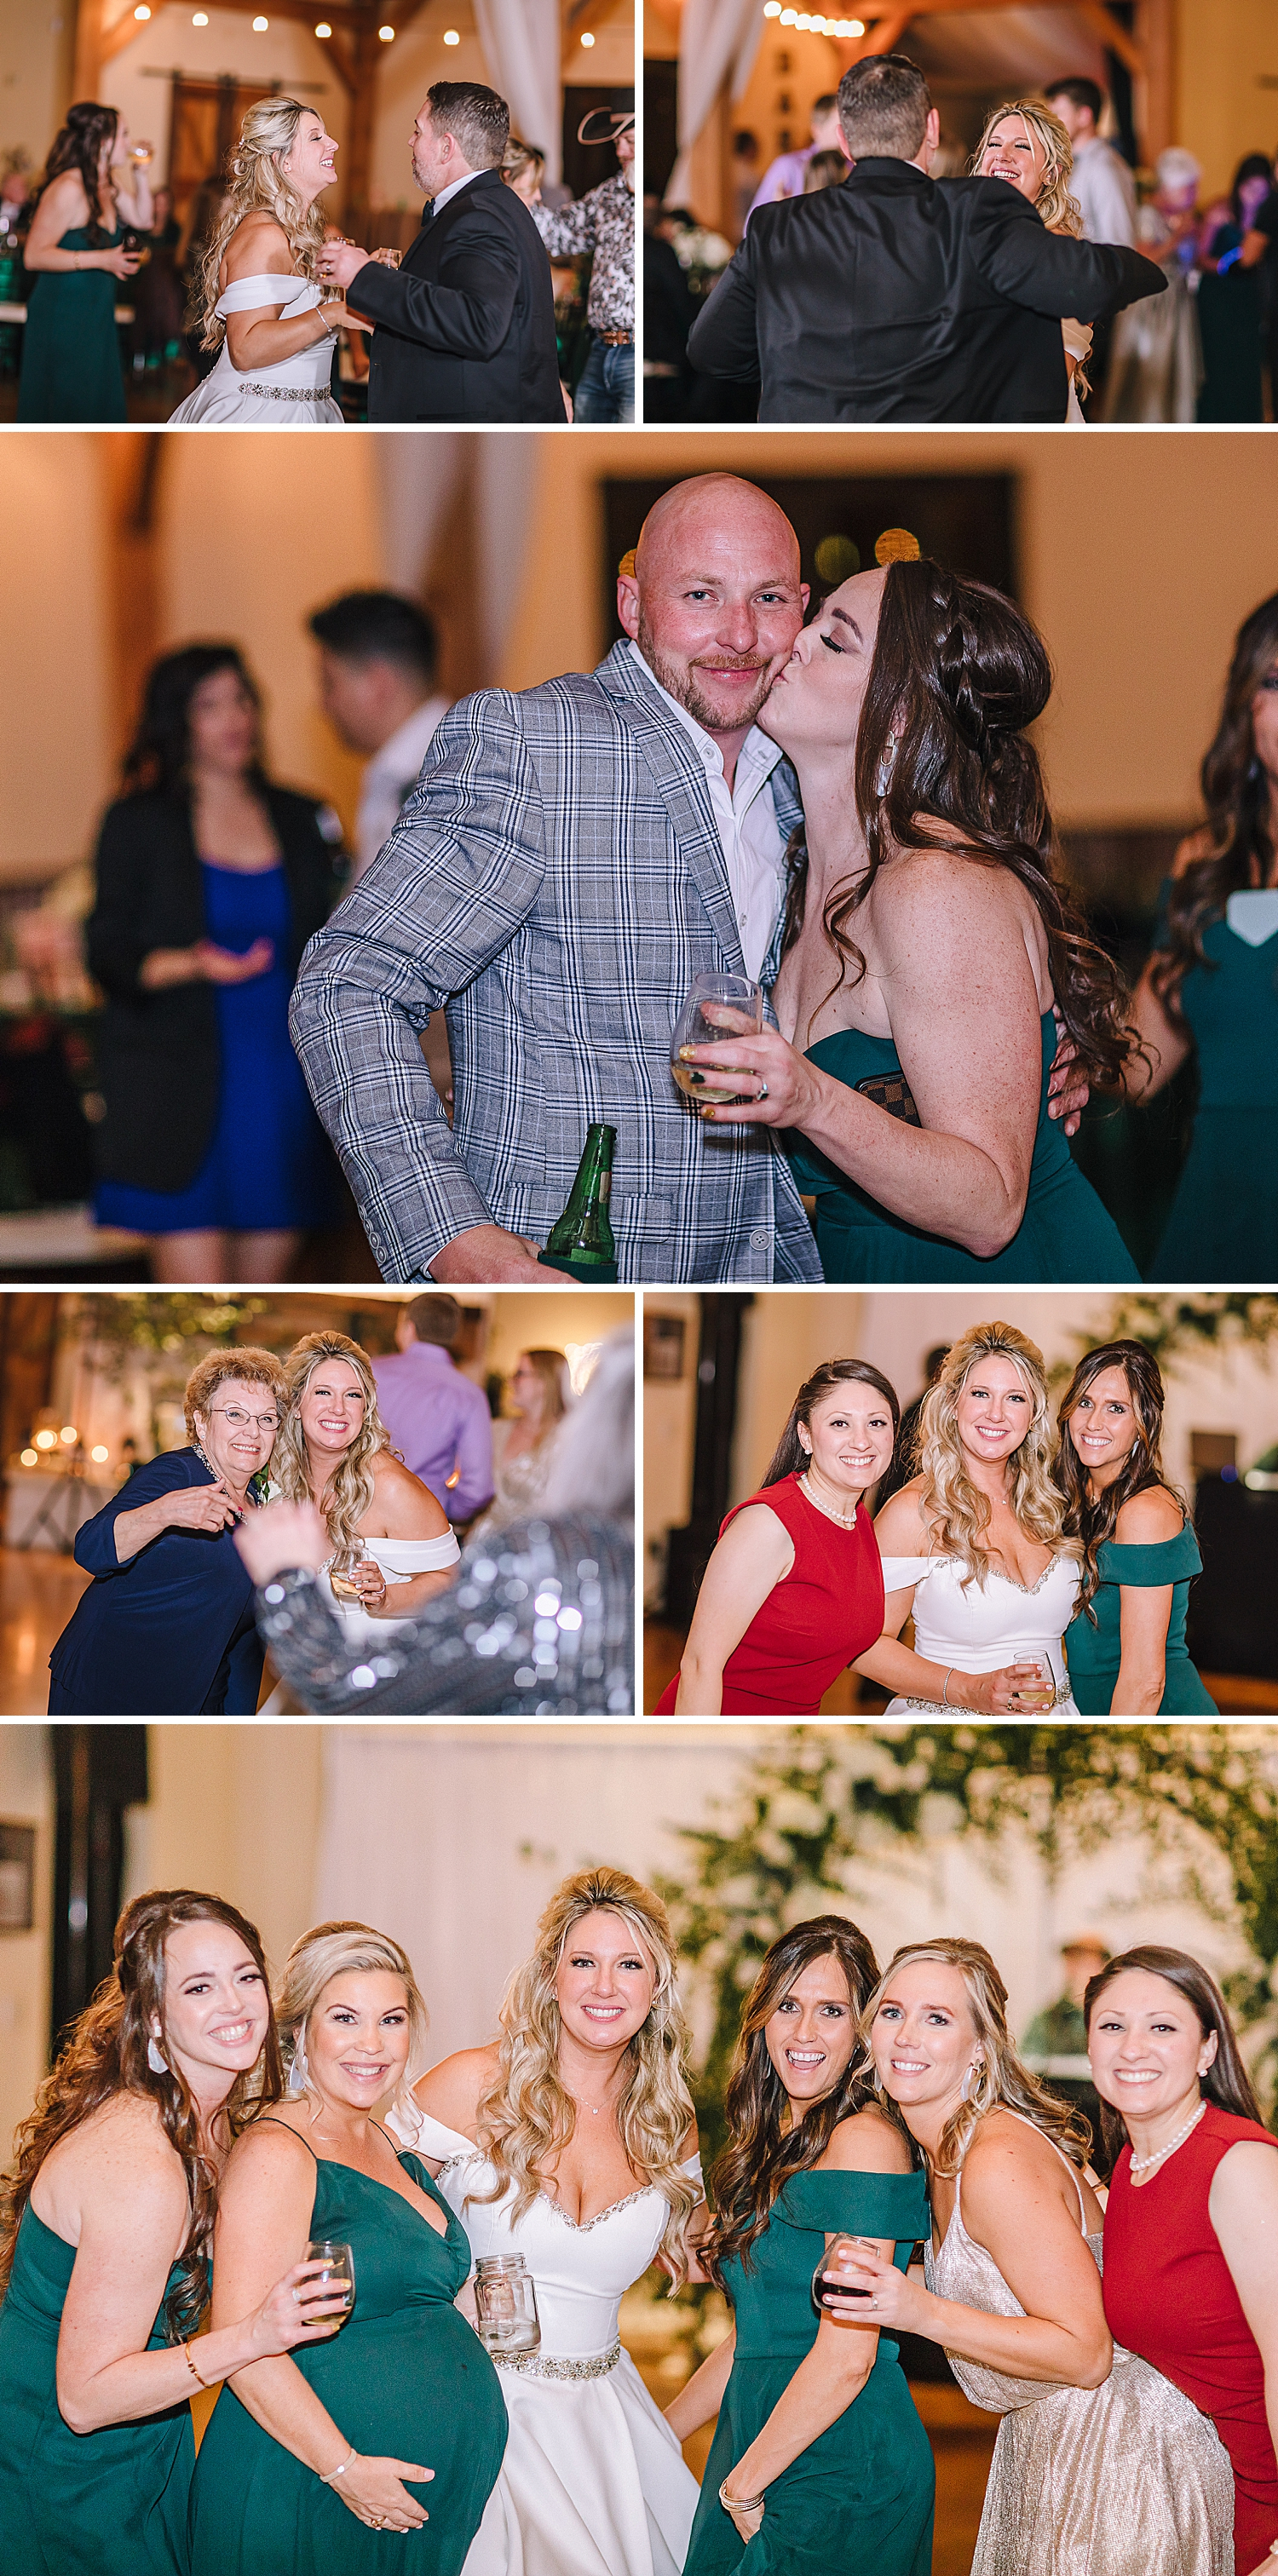 Magnolia-Halle-Wedding-San-Antonio-Texas-Bride-Grom_0099.jpg